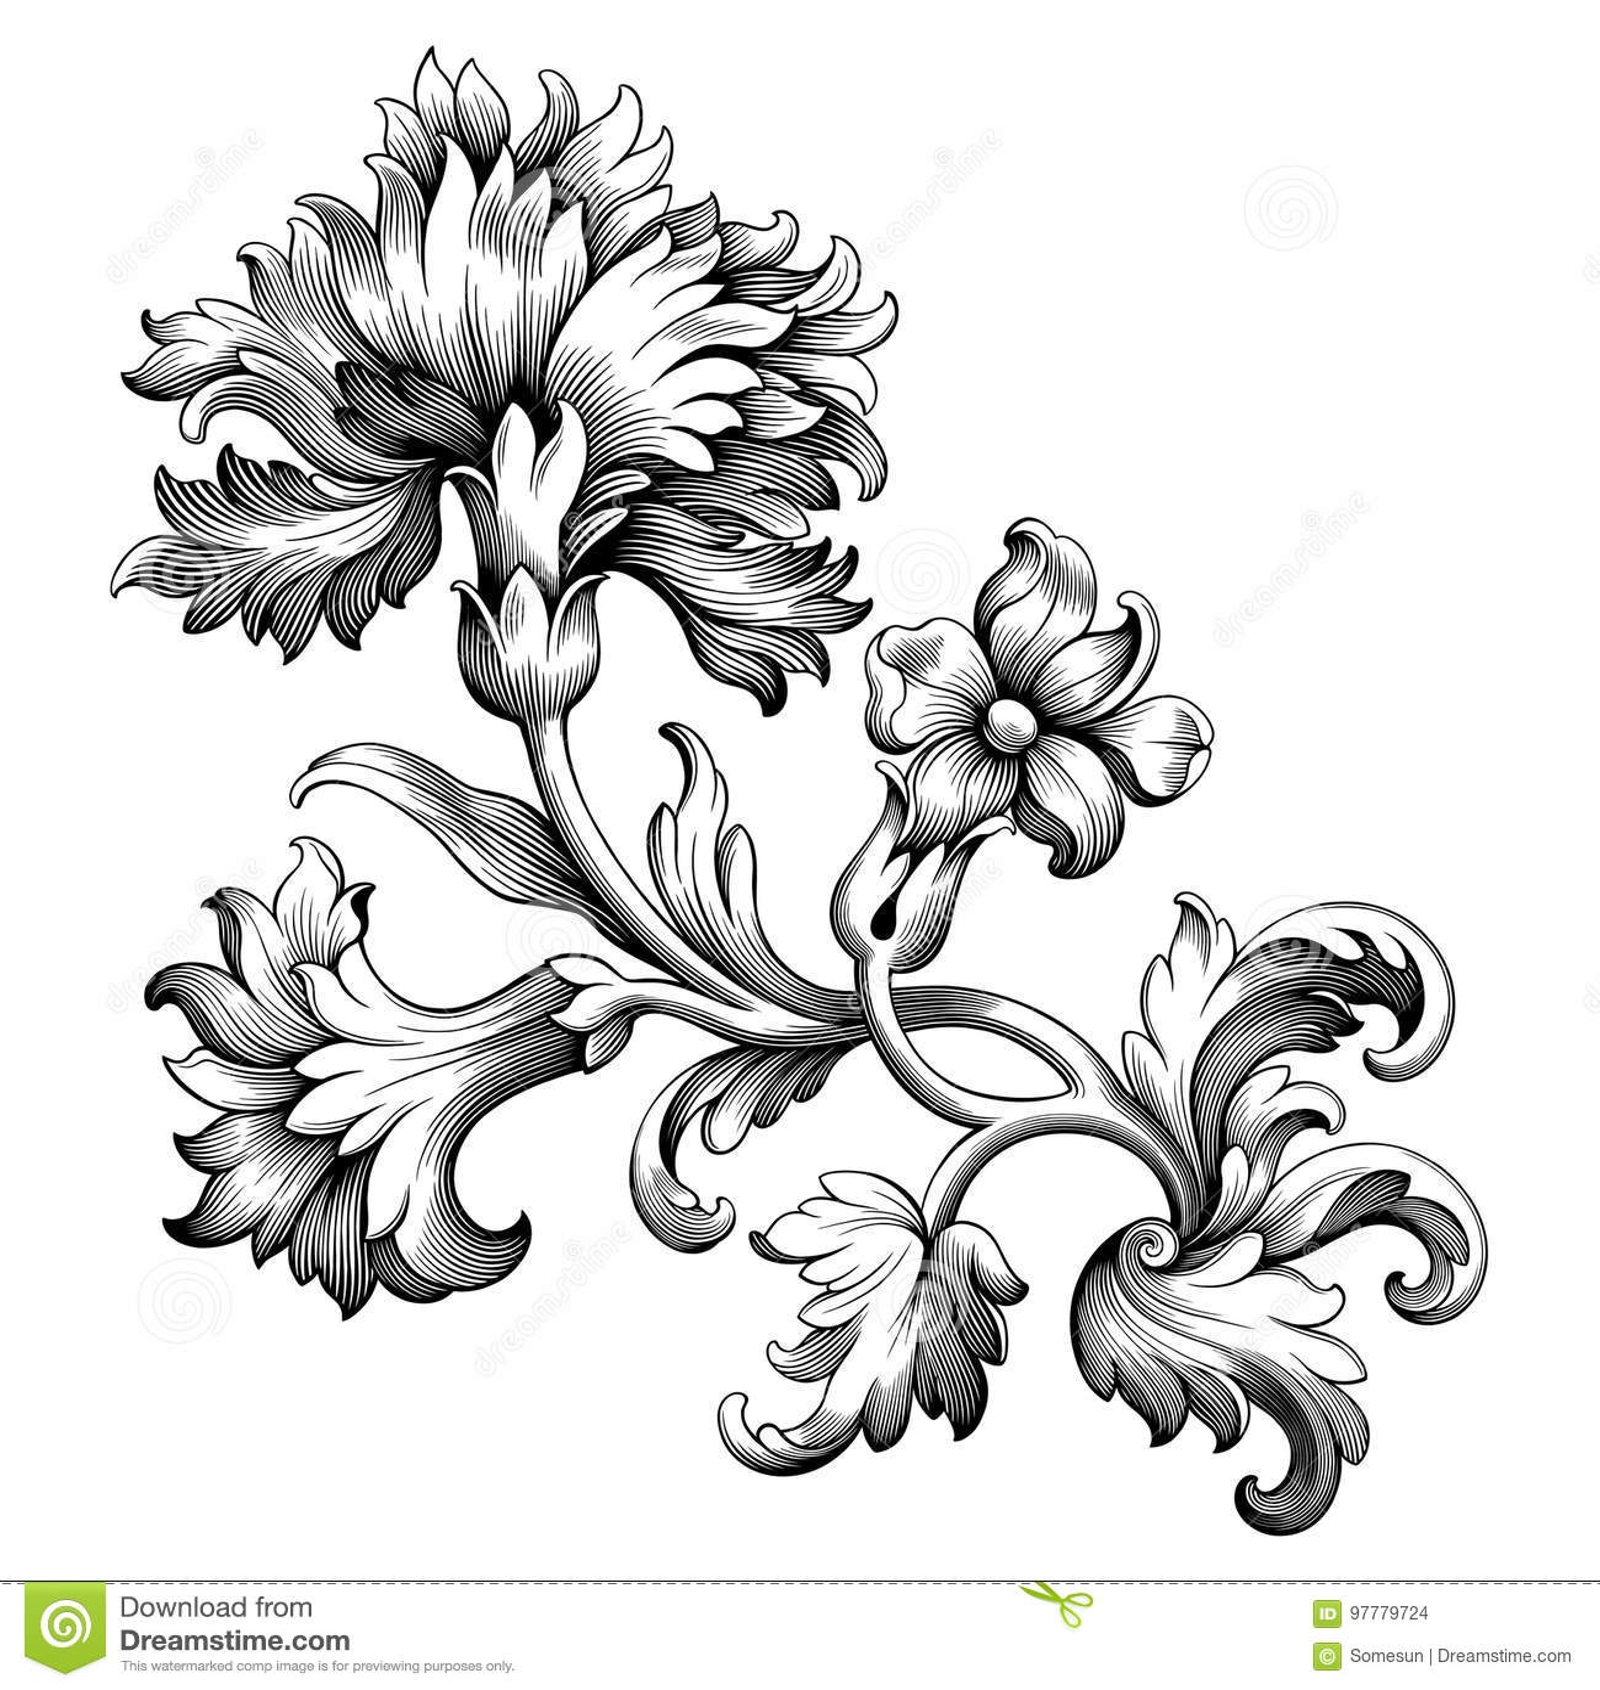 Rose peony flower vintage Baroque Victorian frame border floral ornament scroll engraved retro pattern tattoo filigree vector